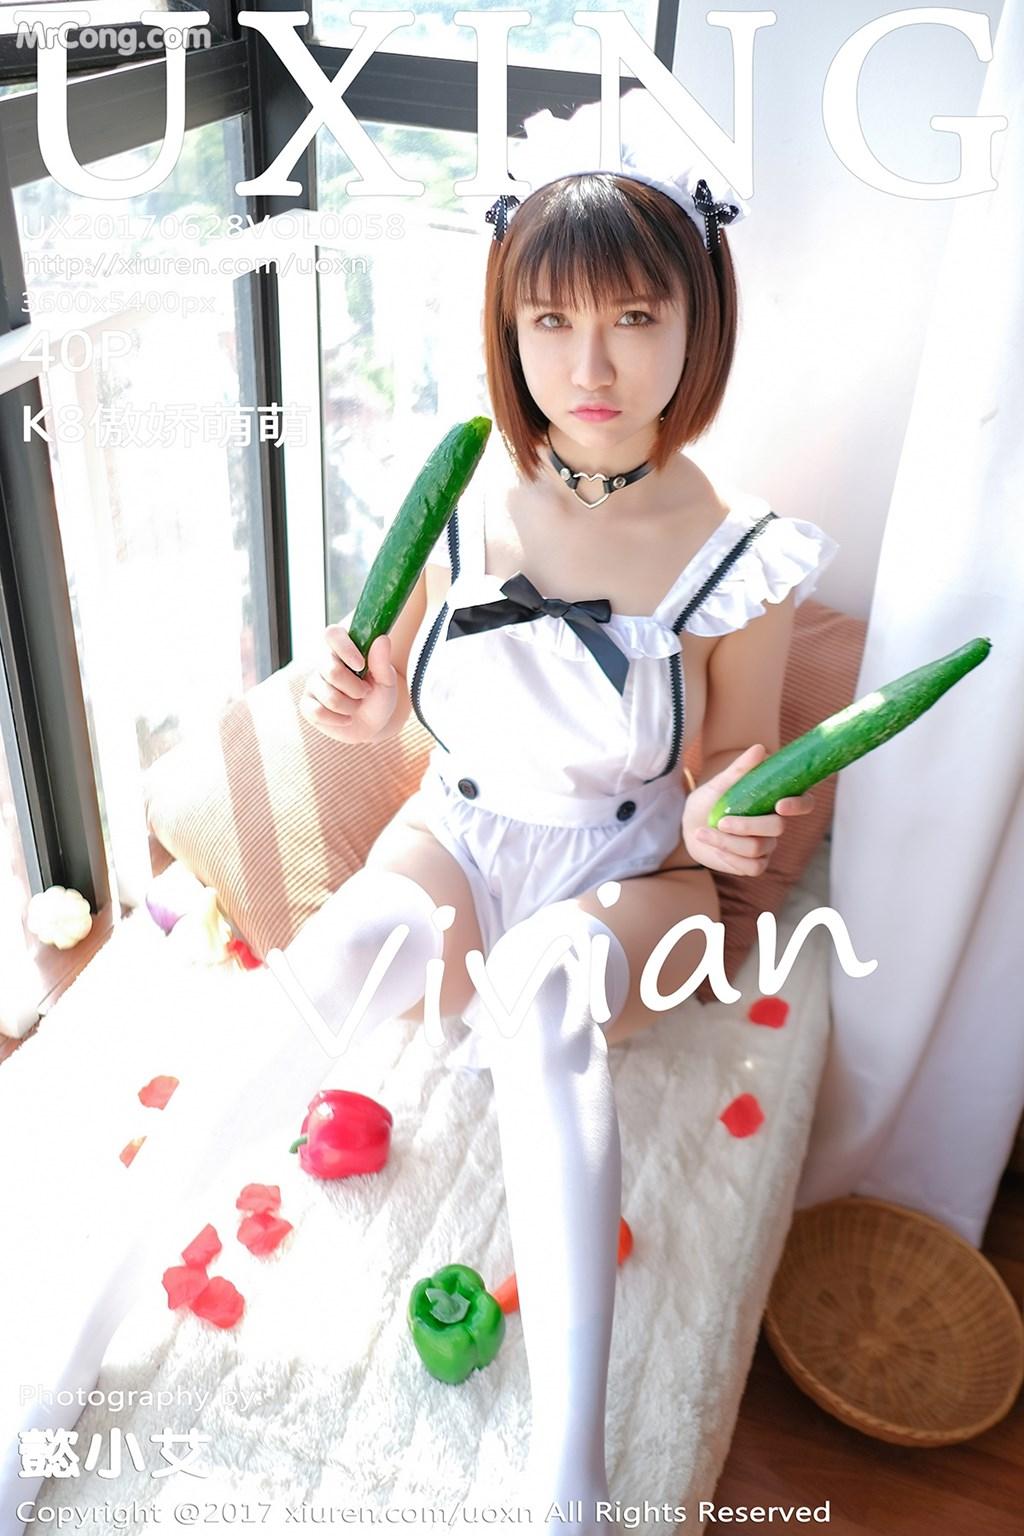 UXING Vol.058: Người mẫu Aojiao Meng Meng (K8傲娇萌萌Vivian) (35 ảnh)